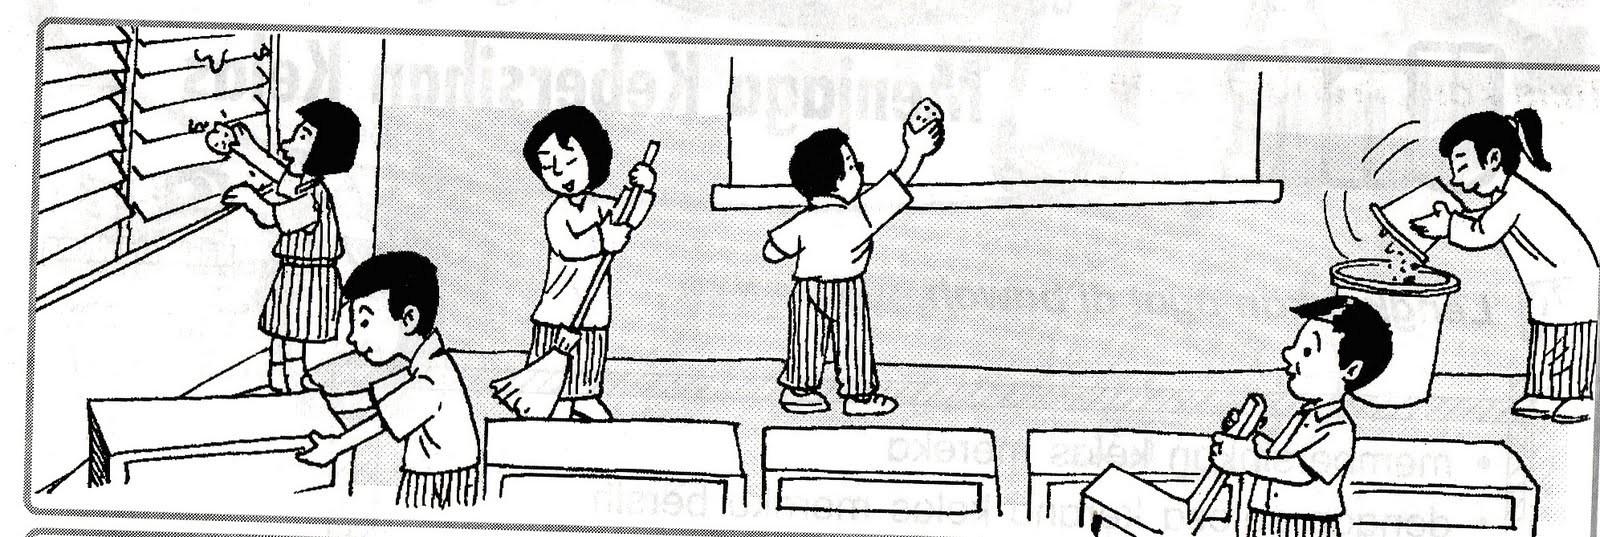 Gotong royong di sekolah clipart 4 » Clipart Portal.